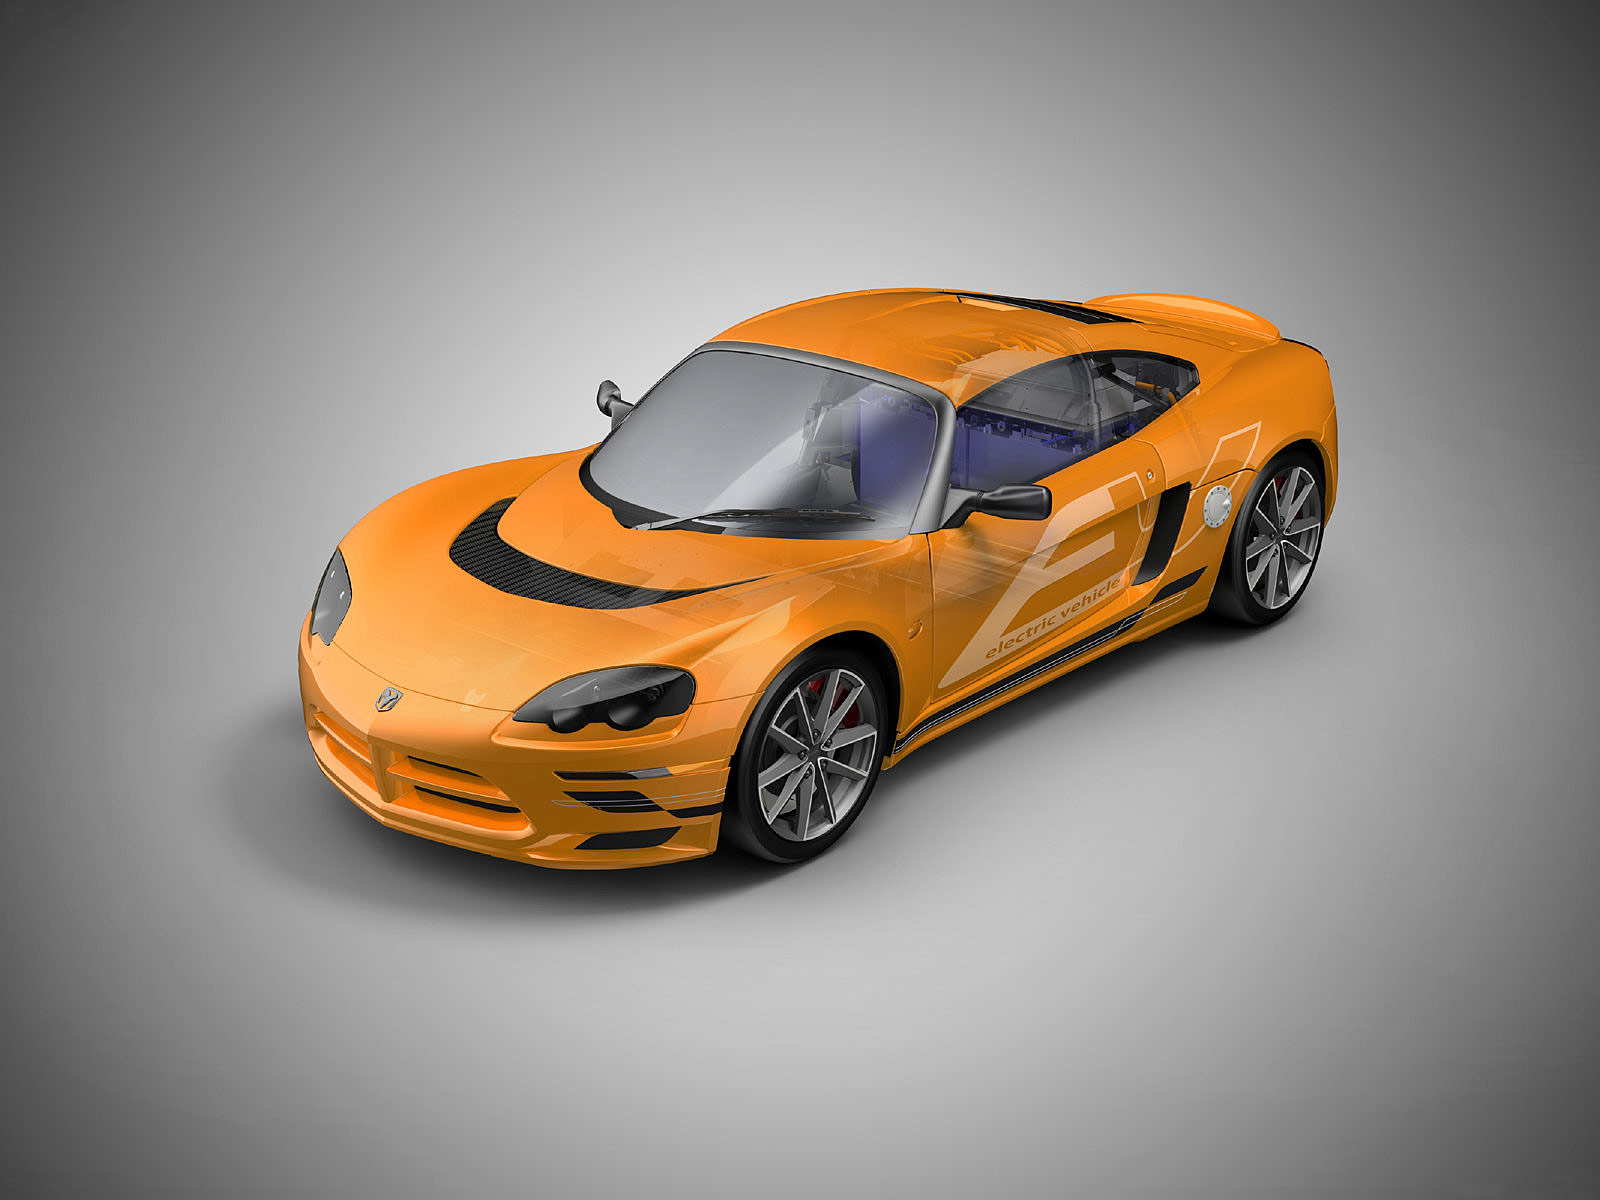 Dodge Circuit Ev Rear 3 4 Dodge Circuit Ev Rear 3 4 | Short News ...